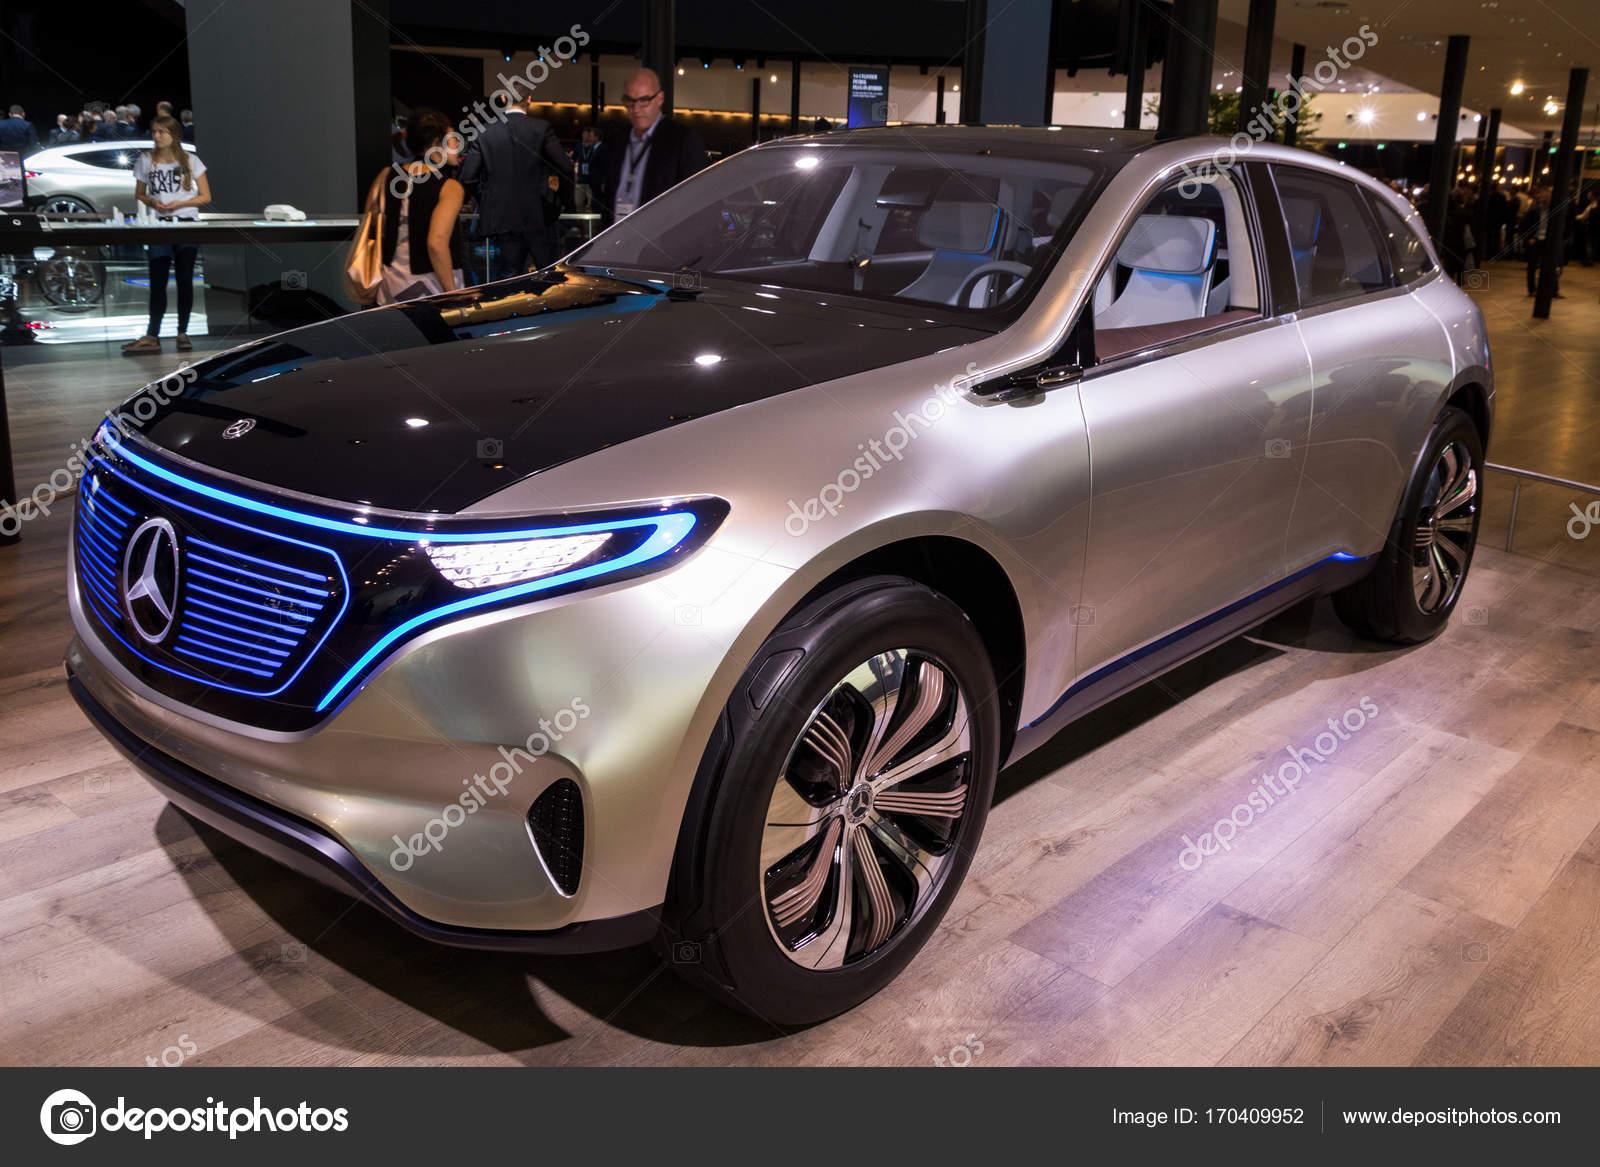 Mercedes benz eq concept electric suv car stock for Mercedes benz eq release date